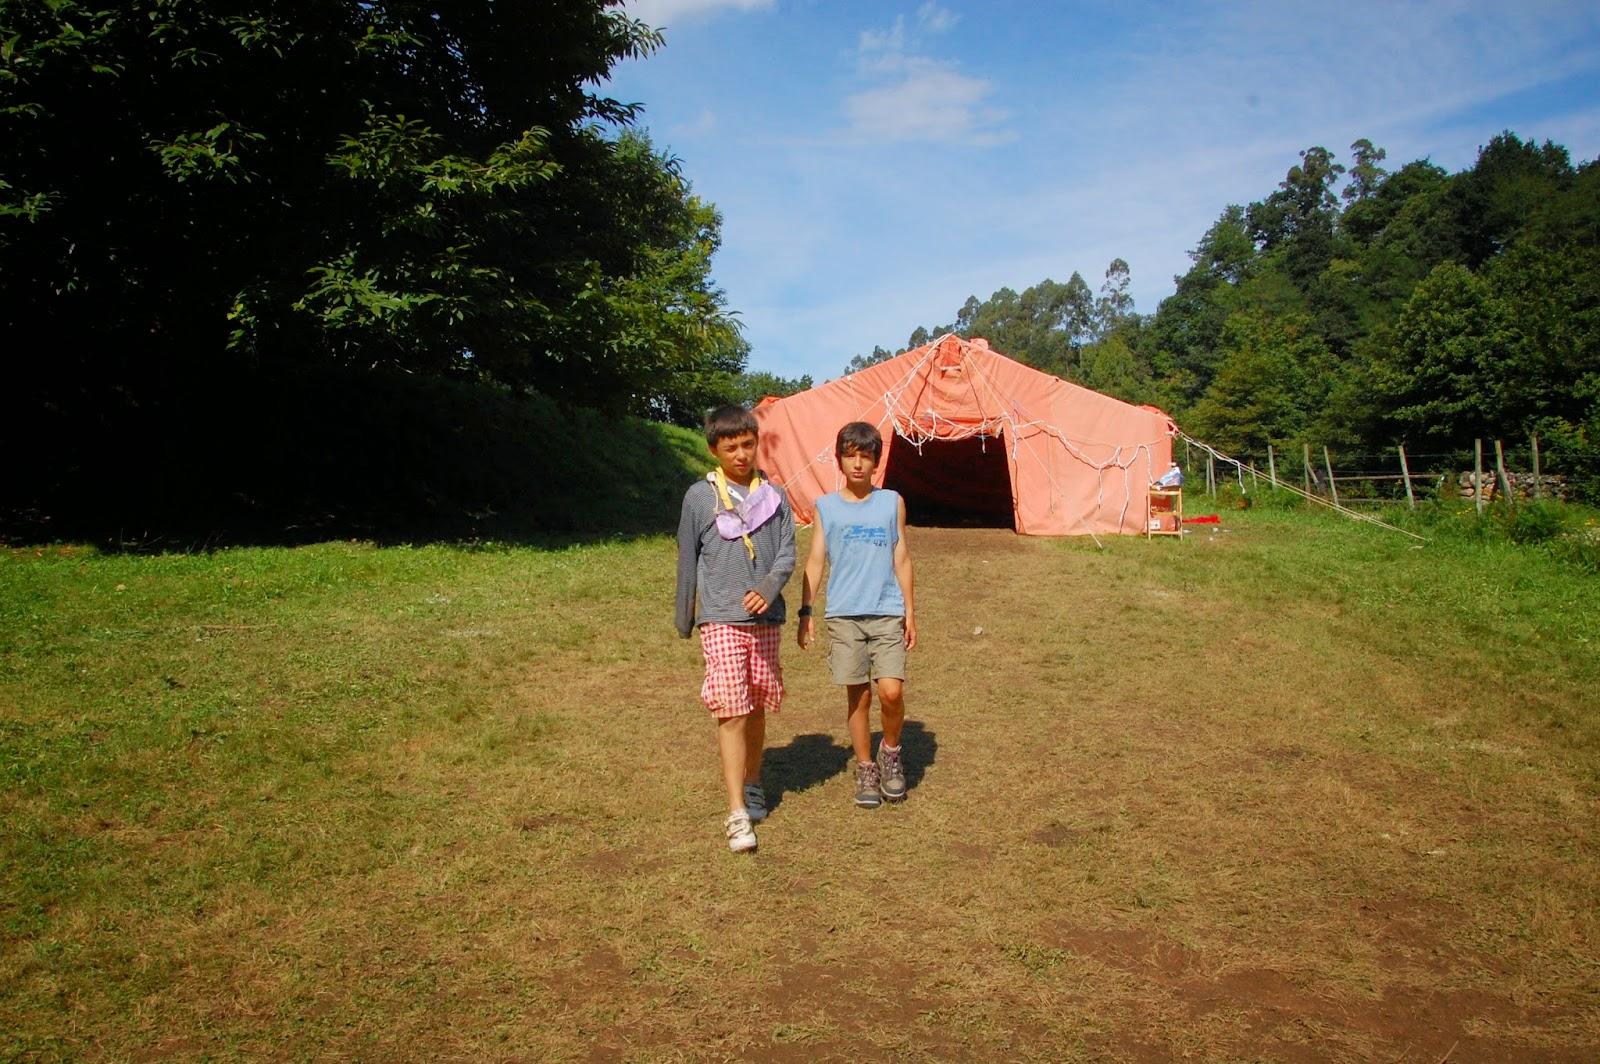 Campaments Estiu RolandKing 2011 - DSC_0137.JPG